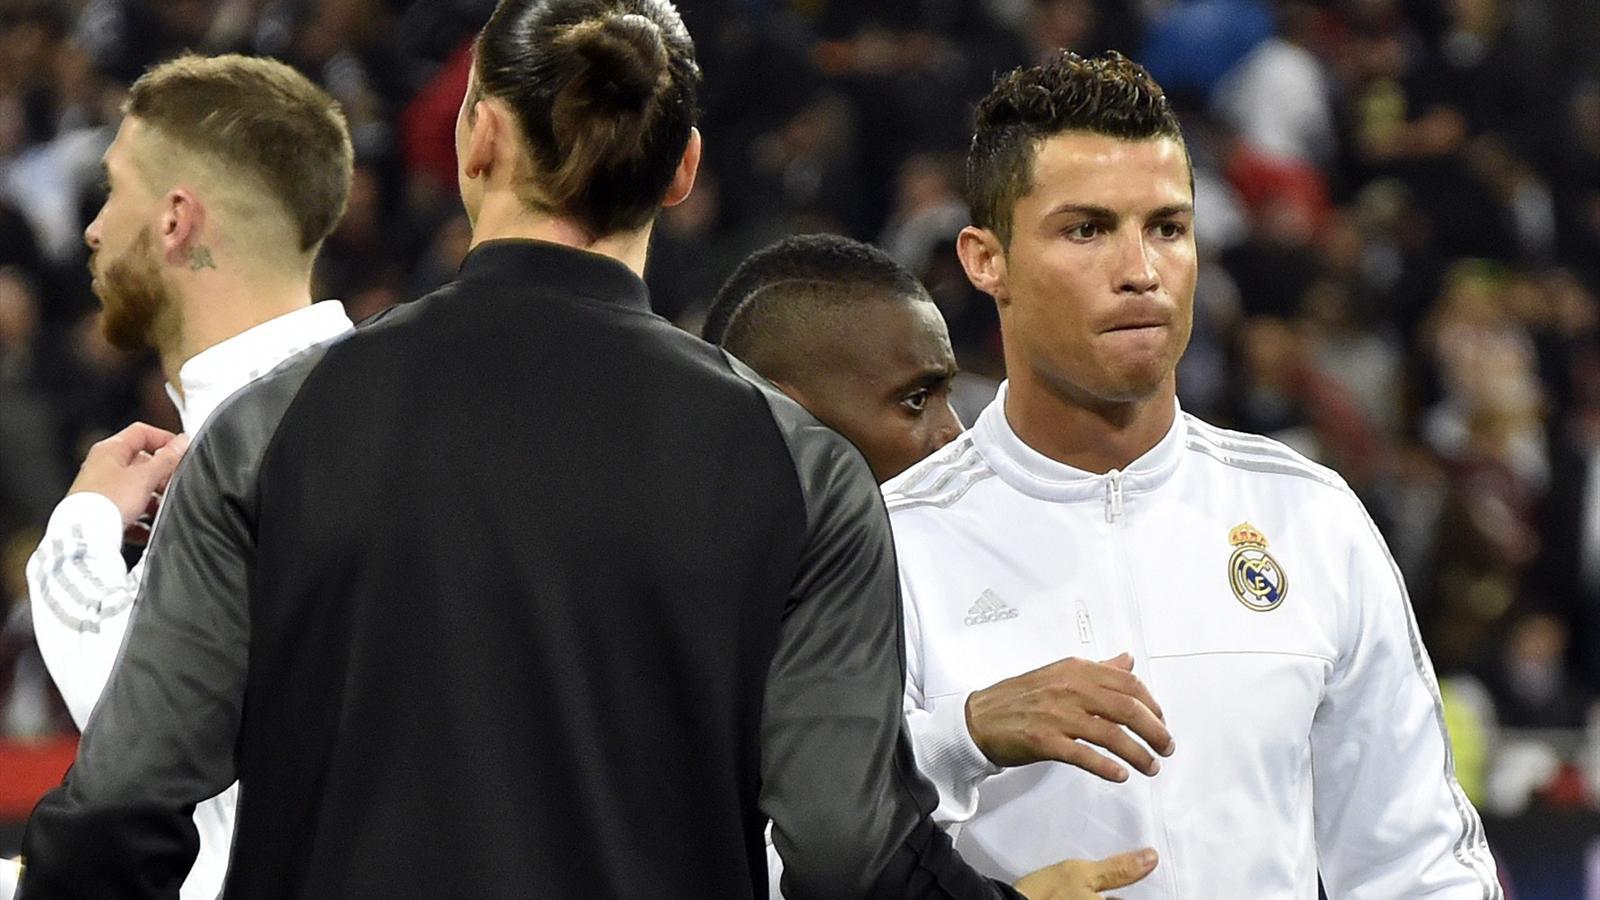 Cristiano Ronaldo greets Zlatan Ibrahimovic